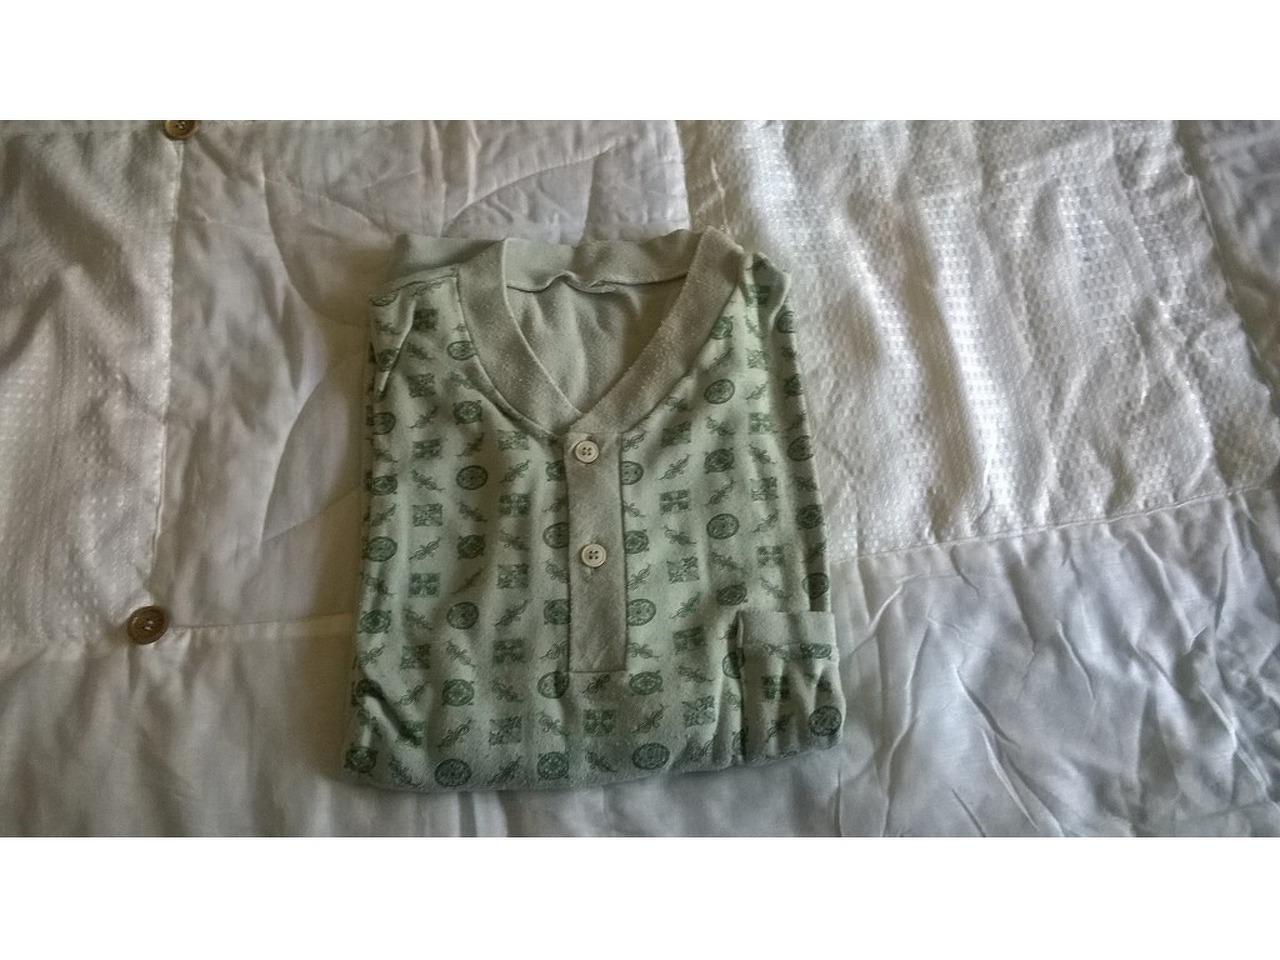 Pijamas (segunda mão) - 11/12